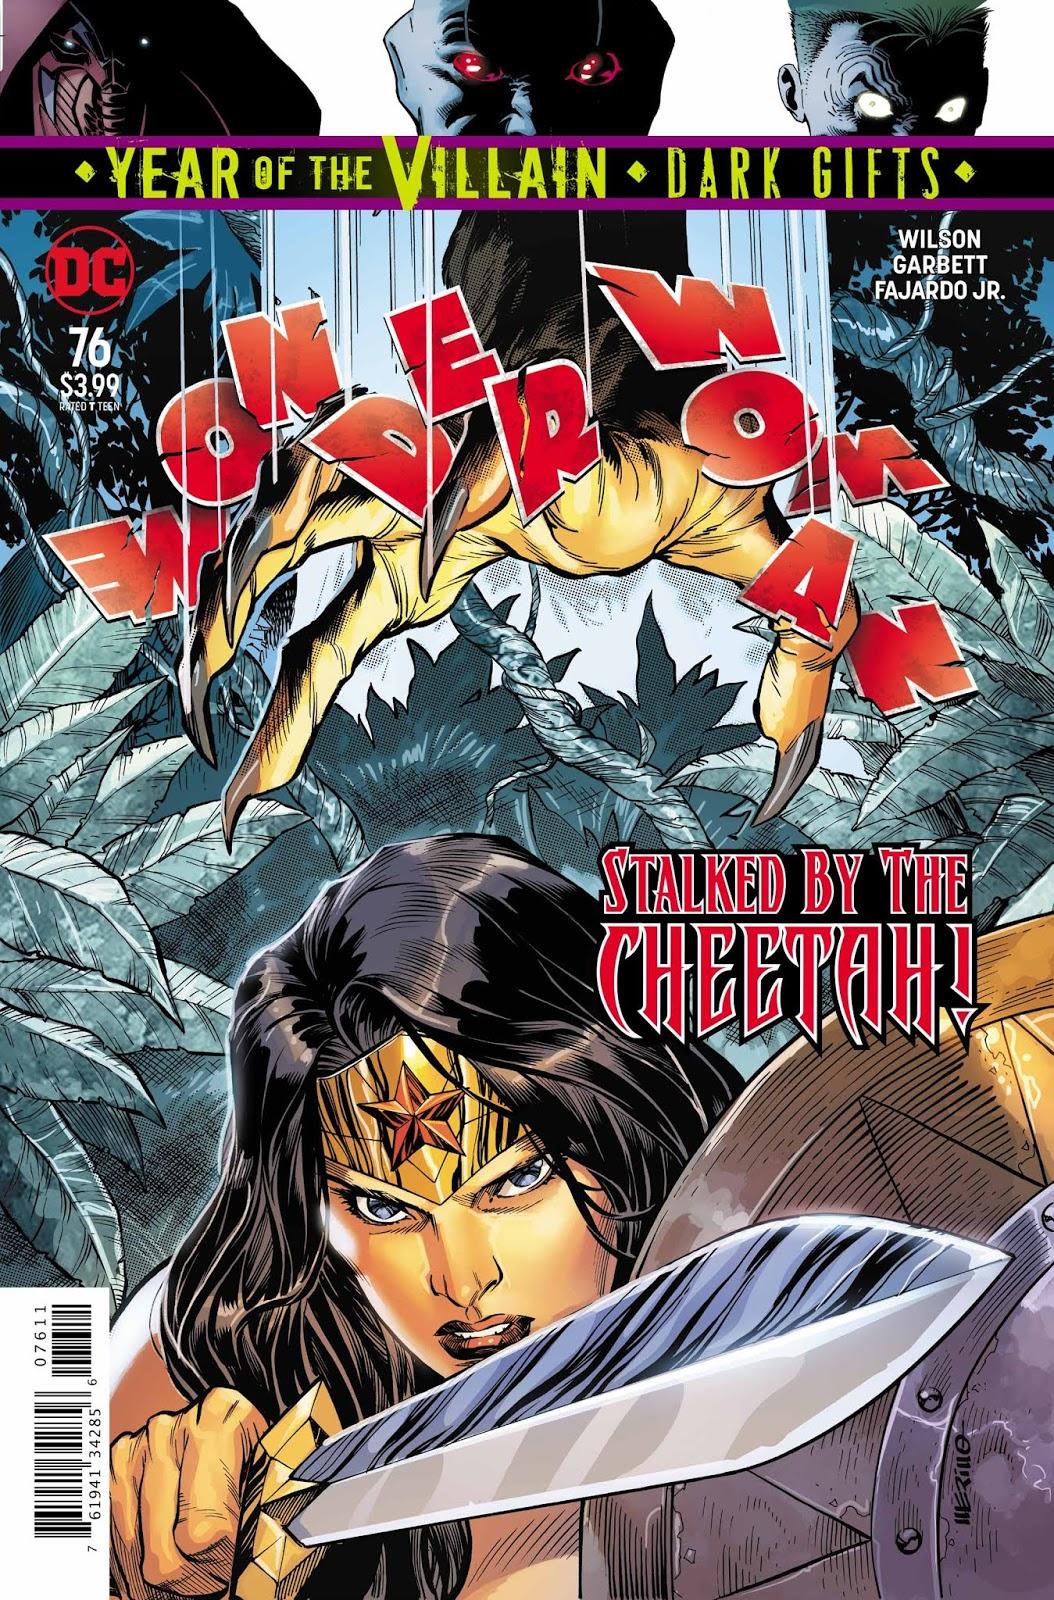 Batman dating Wonder Woman